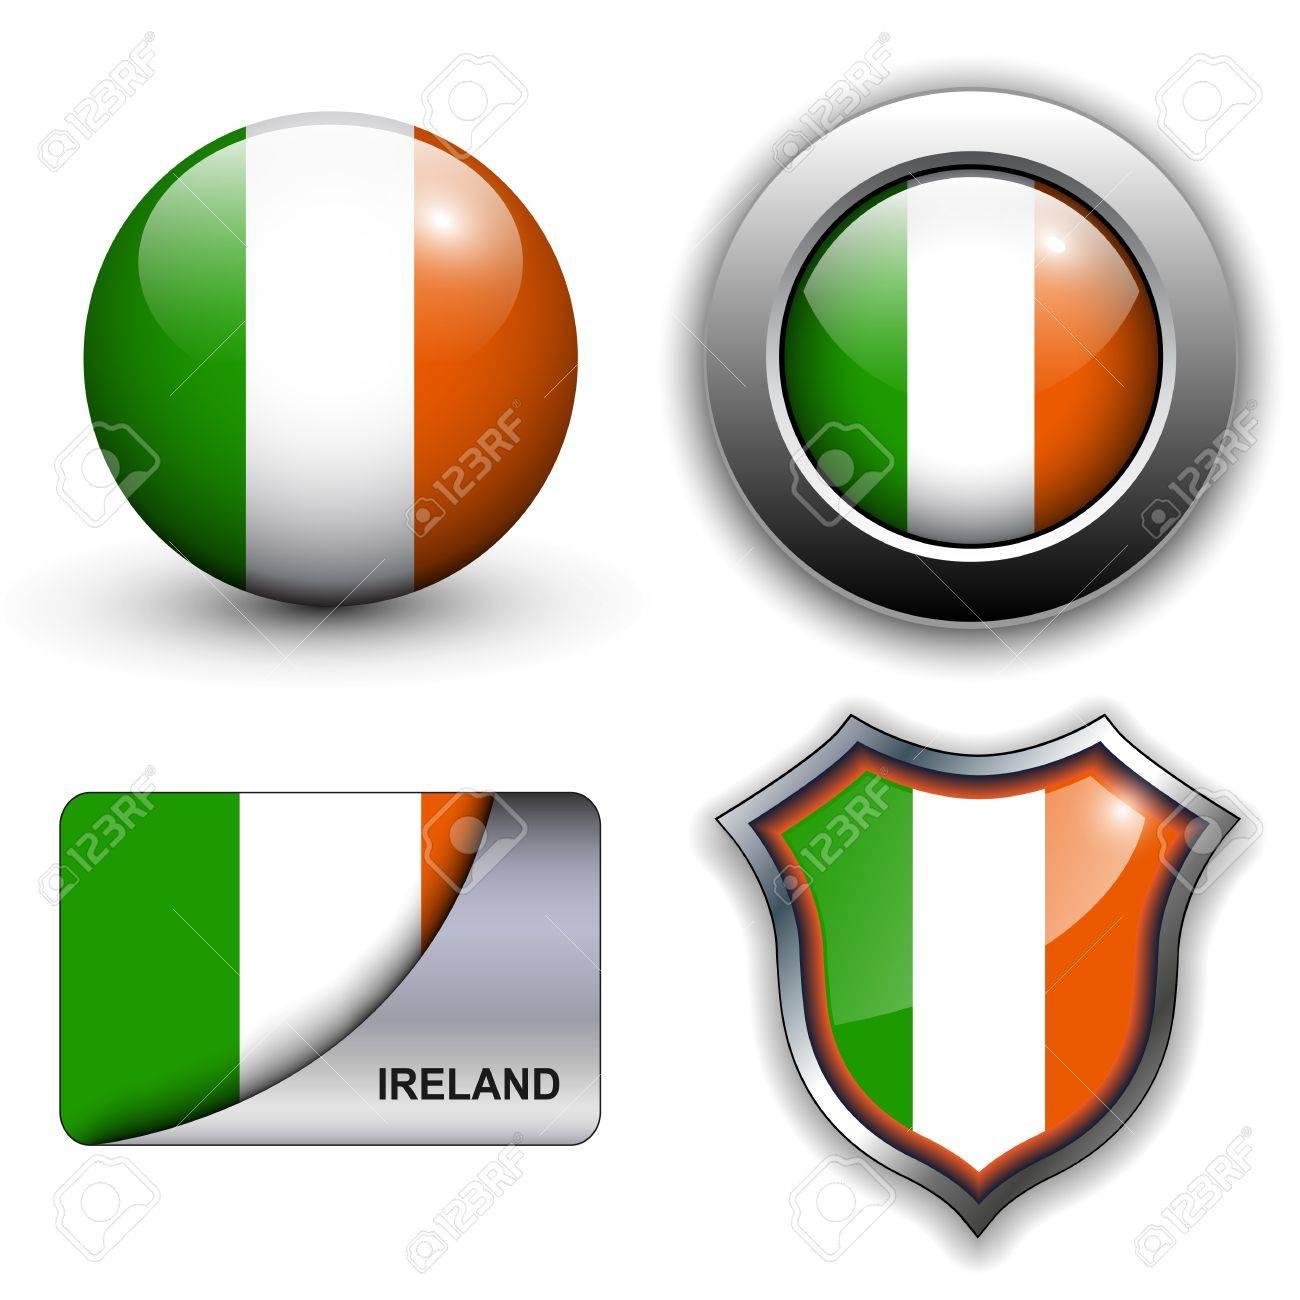 Ireland flag icons theme. Stock Vector - 13272273